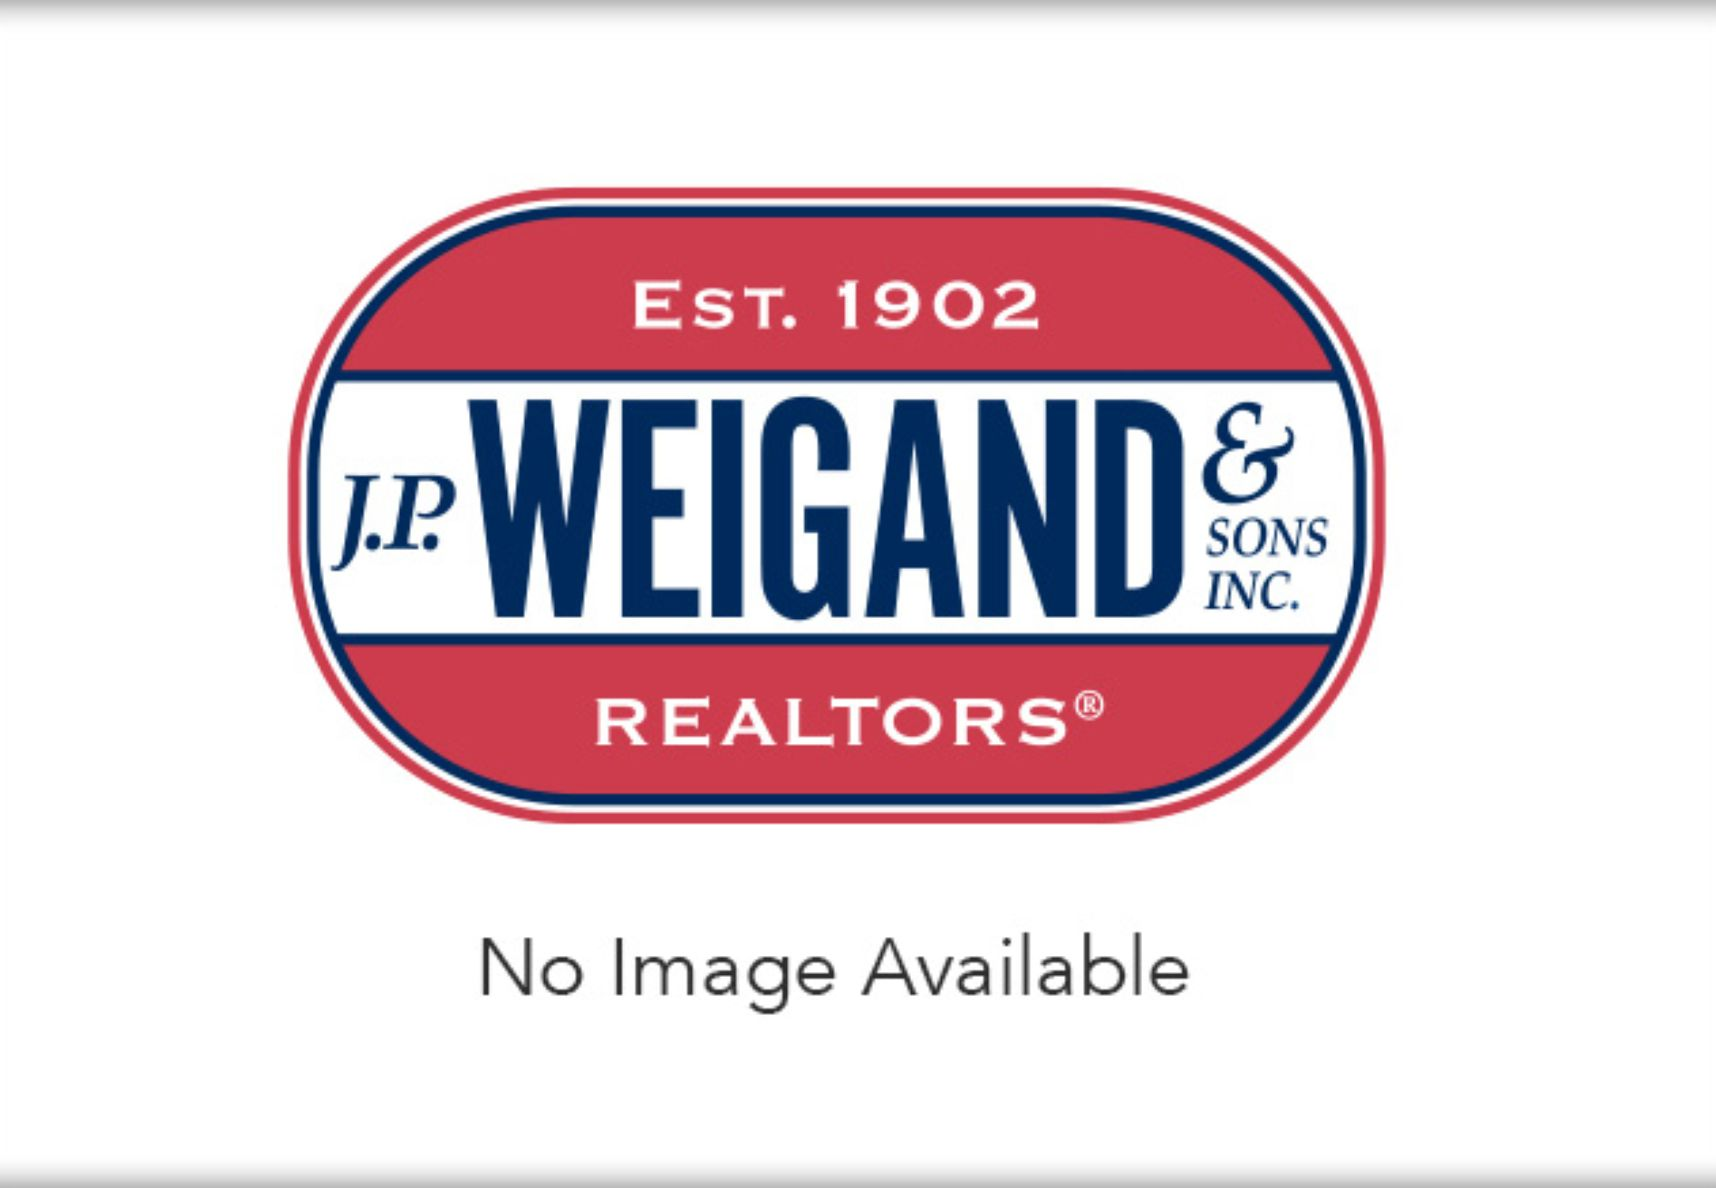 433 N WESTFIELD CT Wichita, KS 67212 - Photo 2